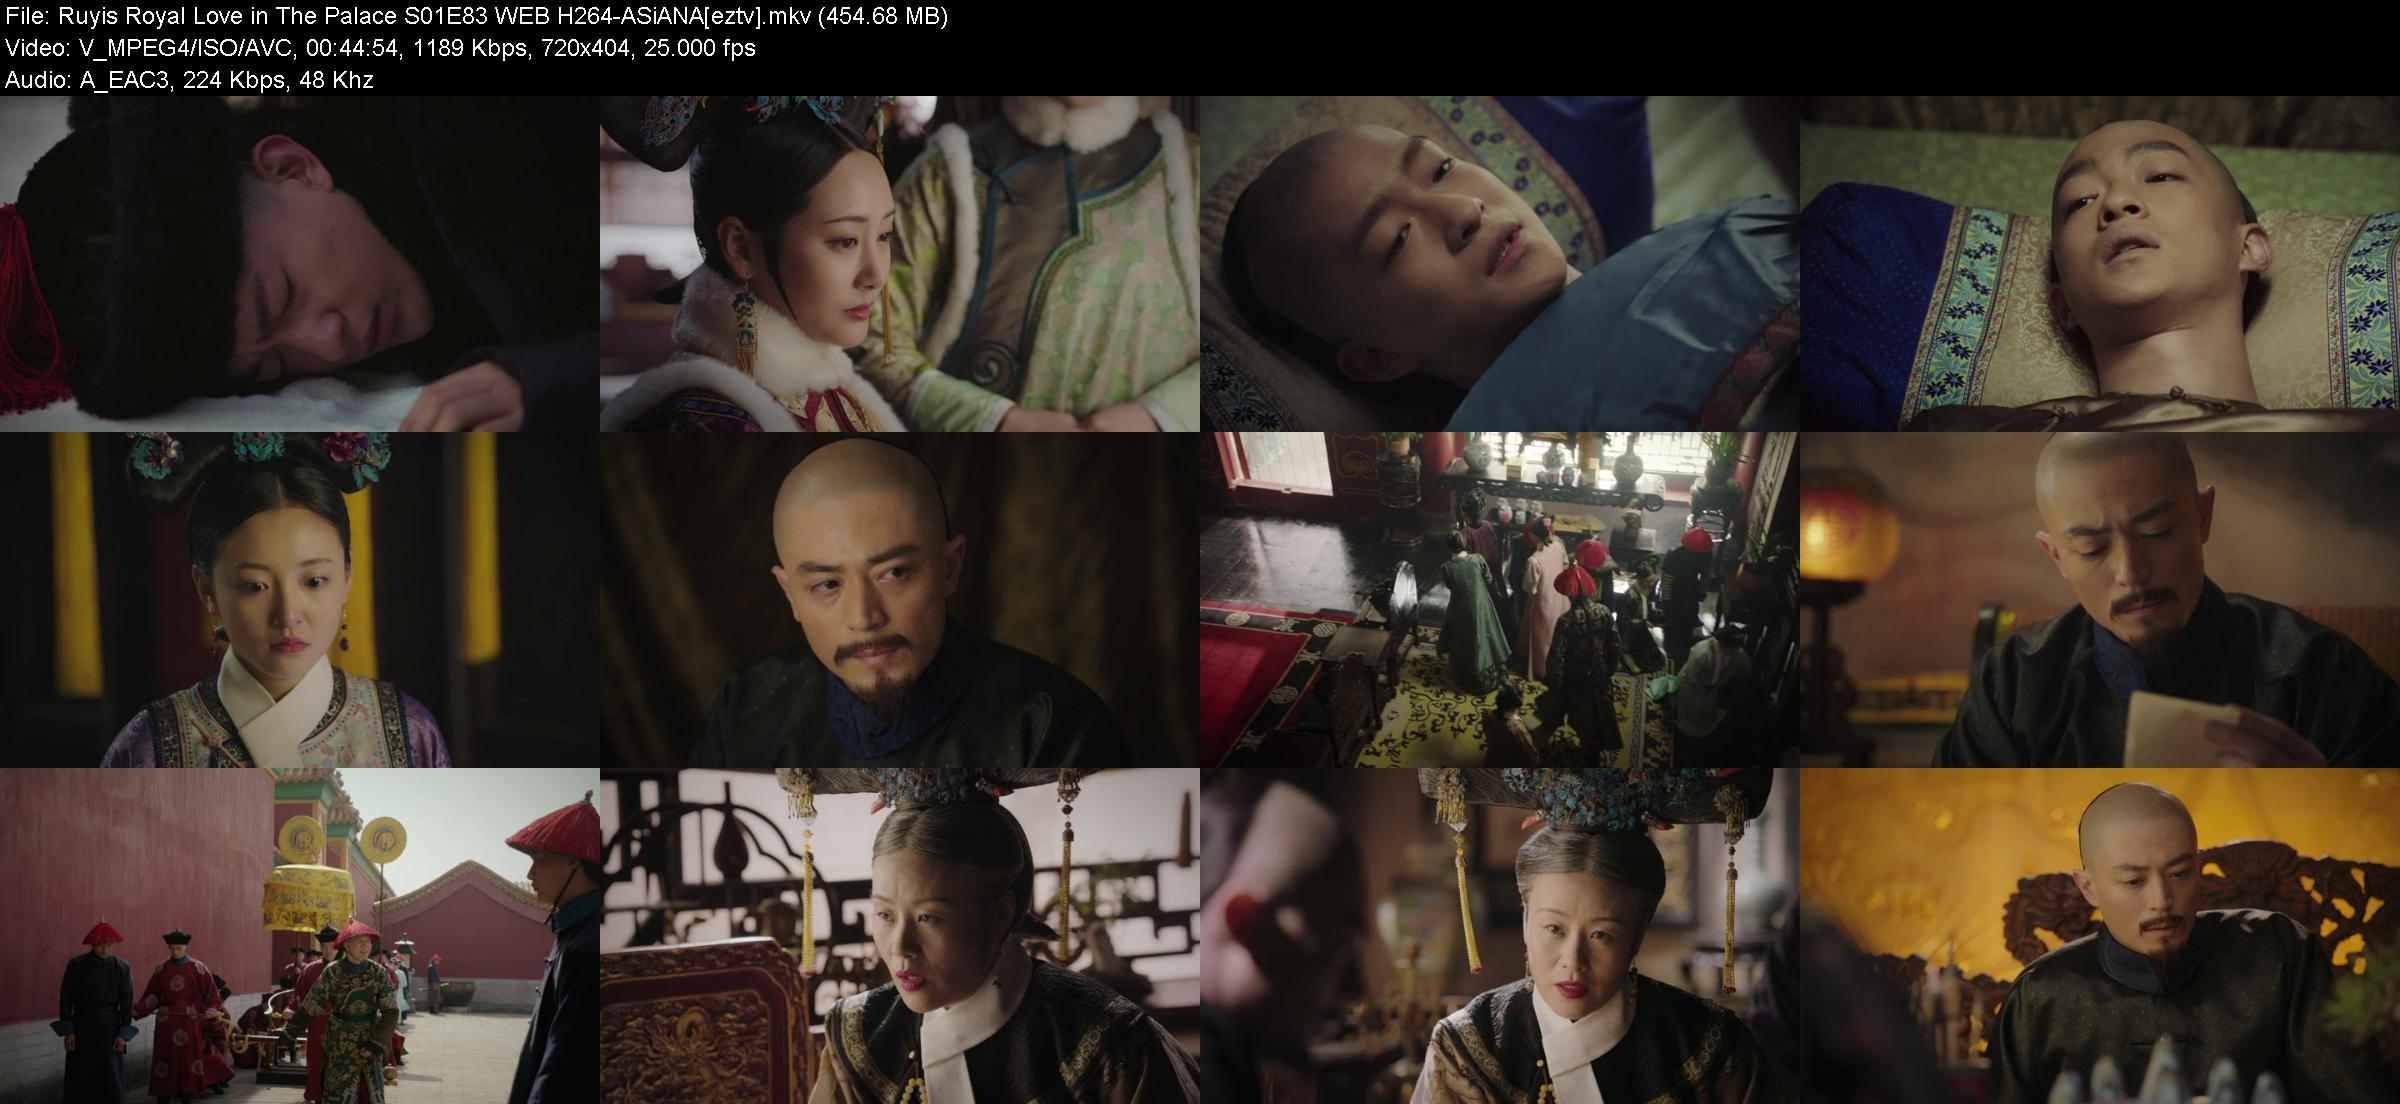 Ruyis Royal Love in The Palace S01E83 WEB H264-ASiANA